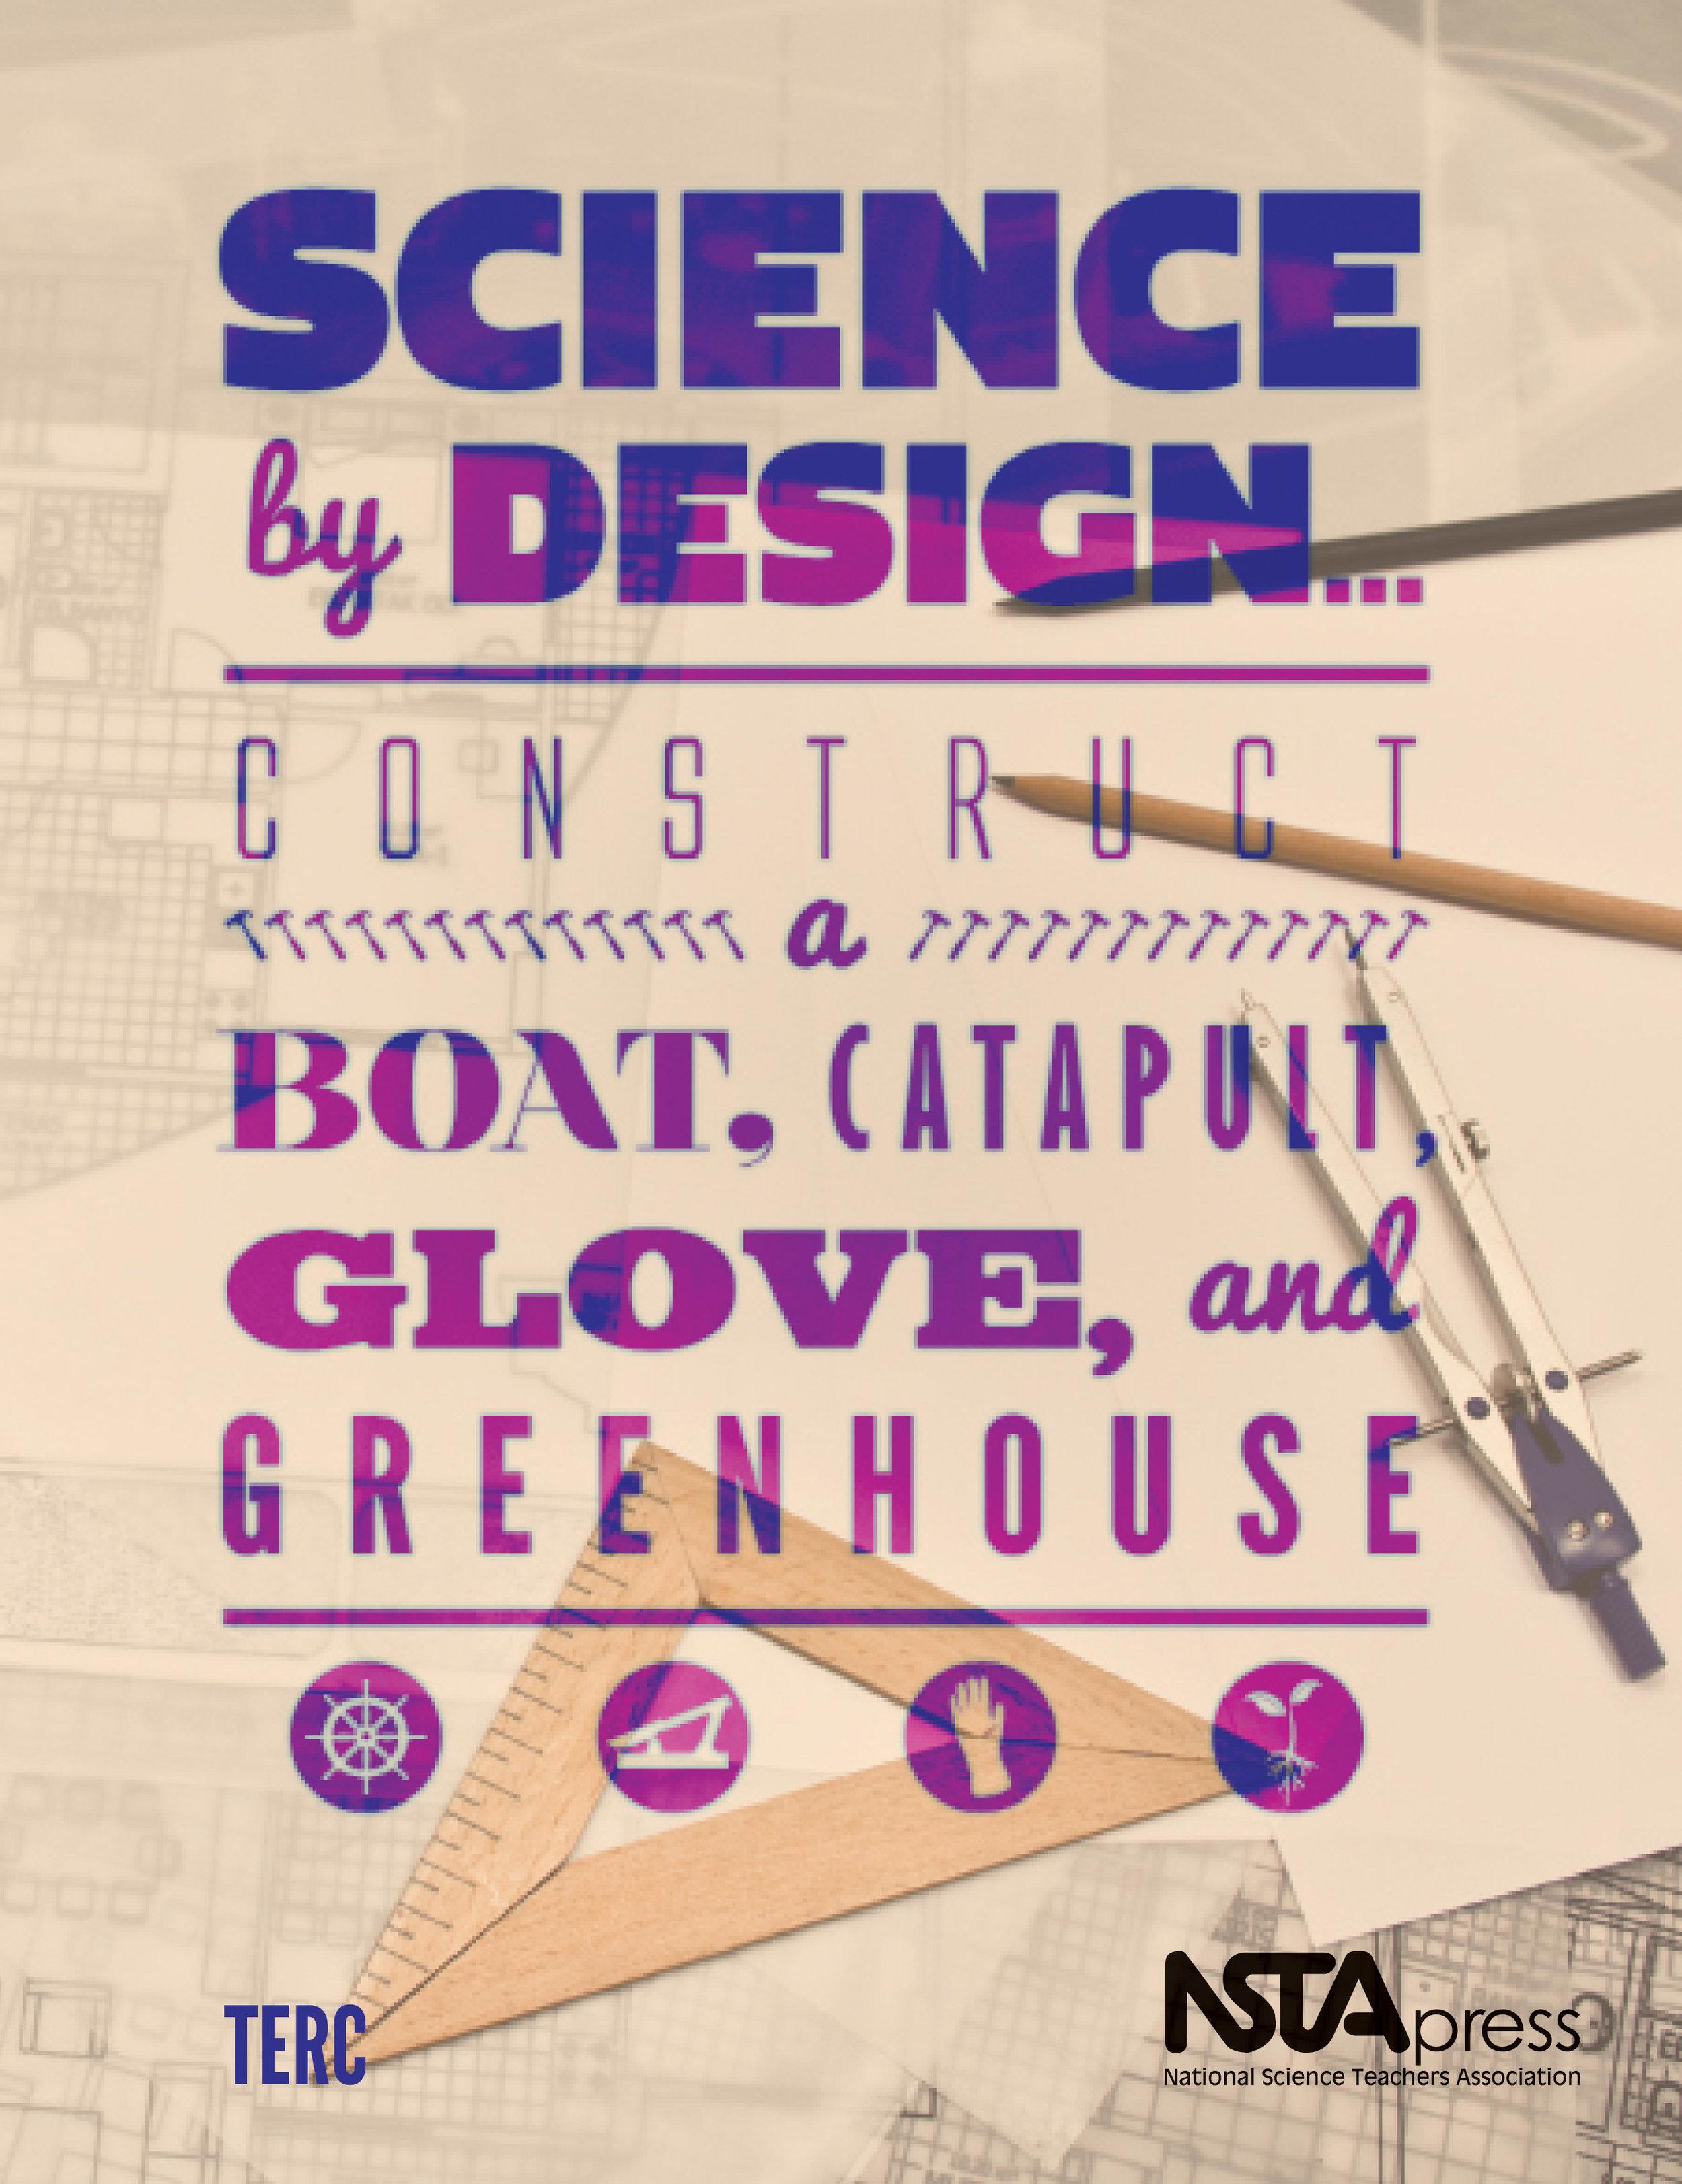 ScienceByDesign.jpg